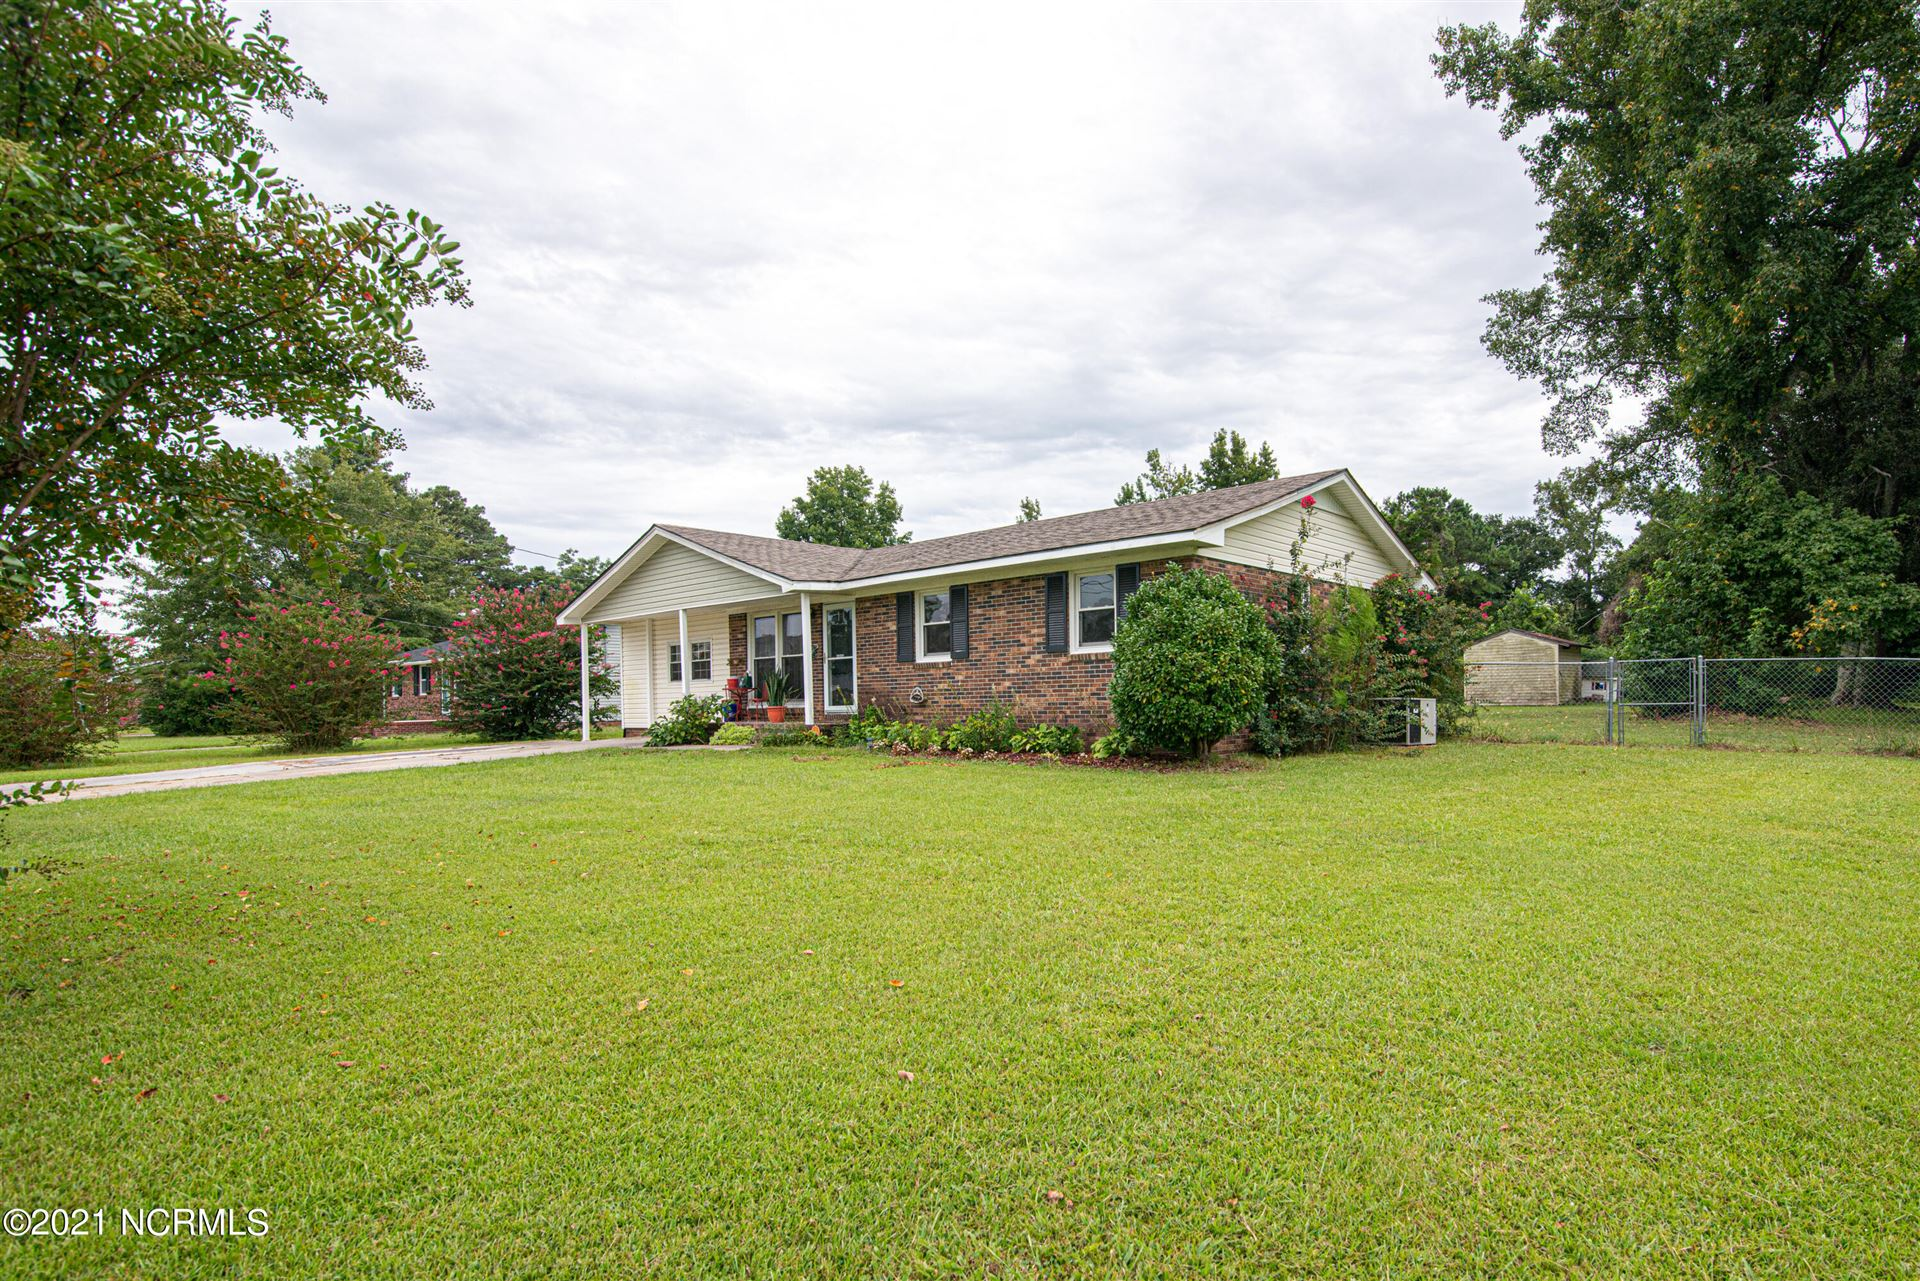 Photo of 4 Sheffield Road, Jacksonville, NC 28546 (MLS # 100290978)